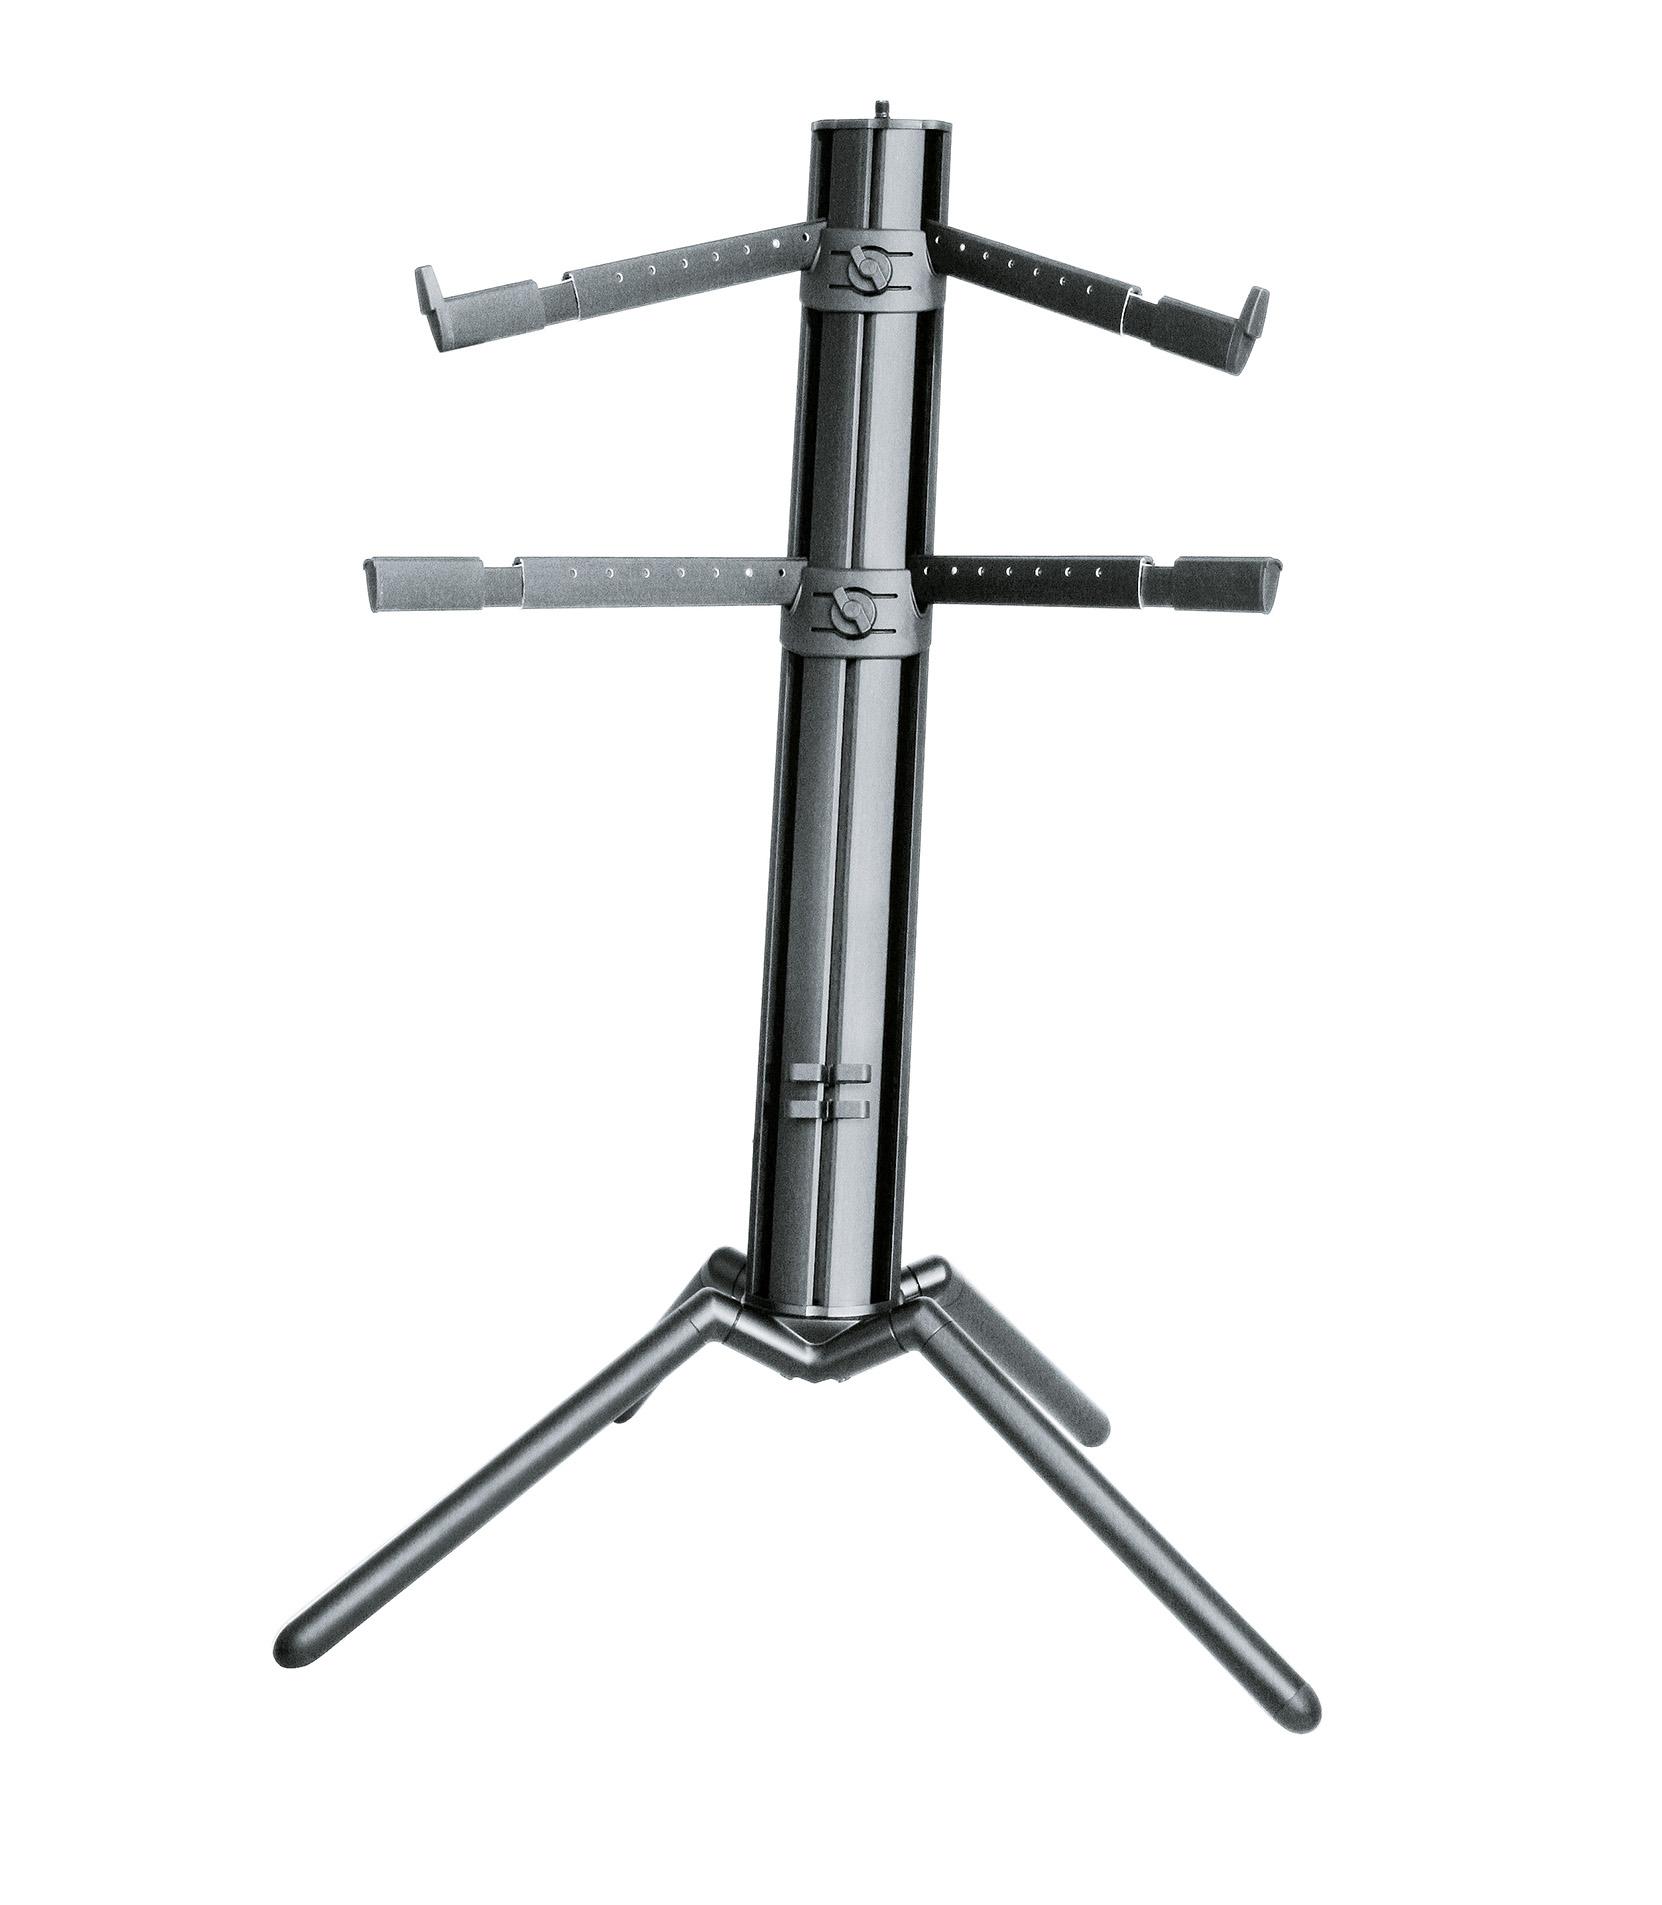 buy k&m 18860 000 35 keyboard stand spider problack